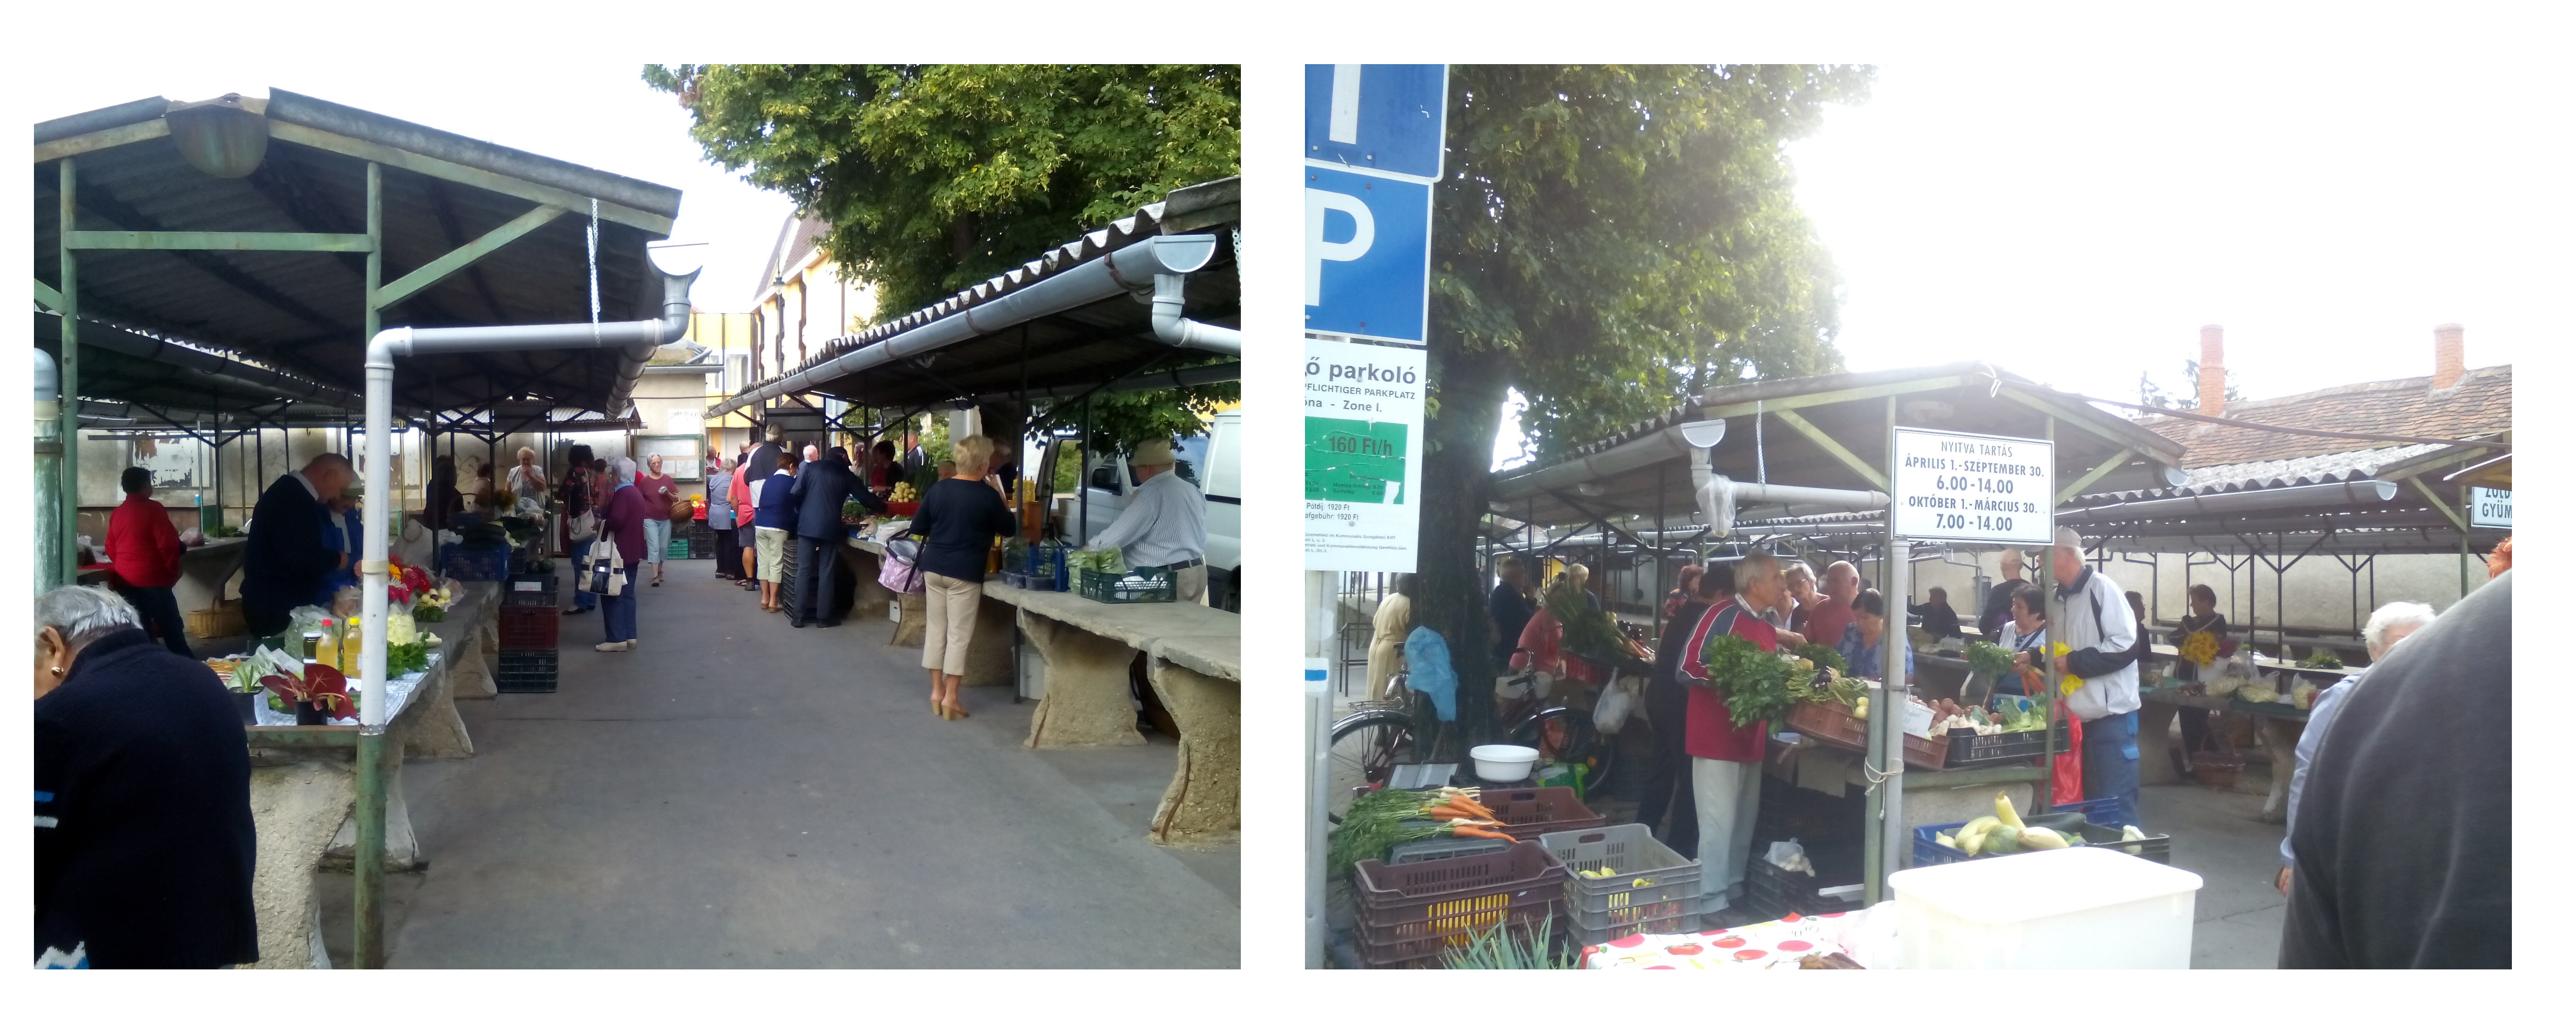 hunyadi téri piac nyitvatartása